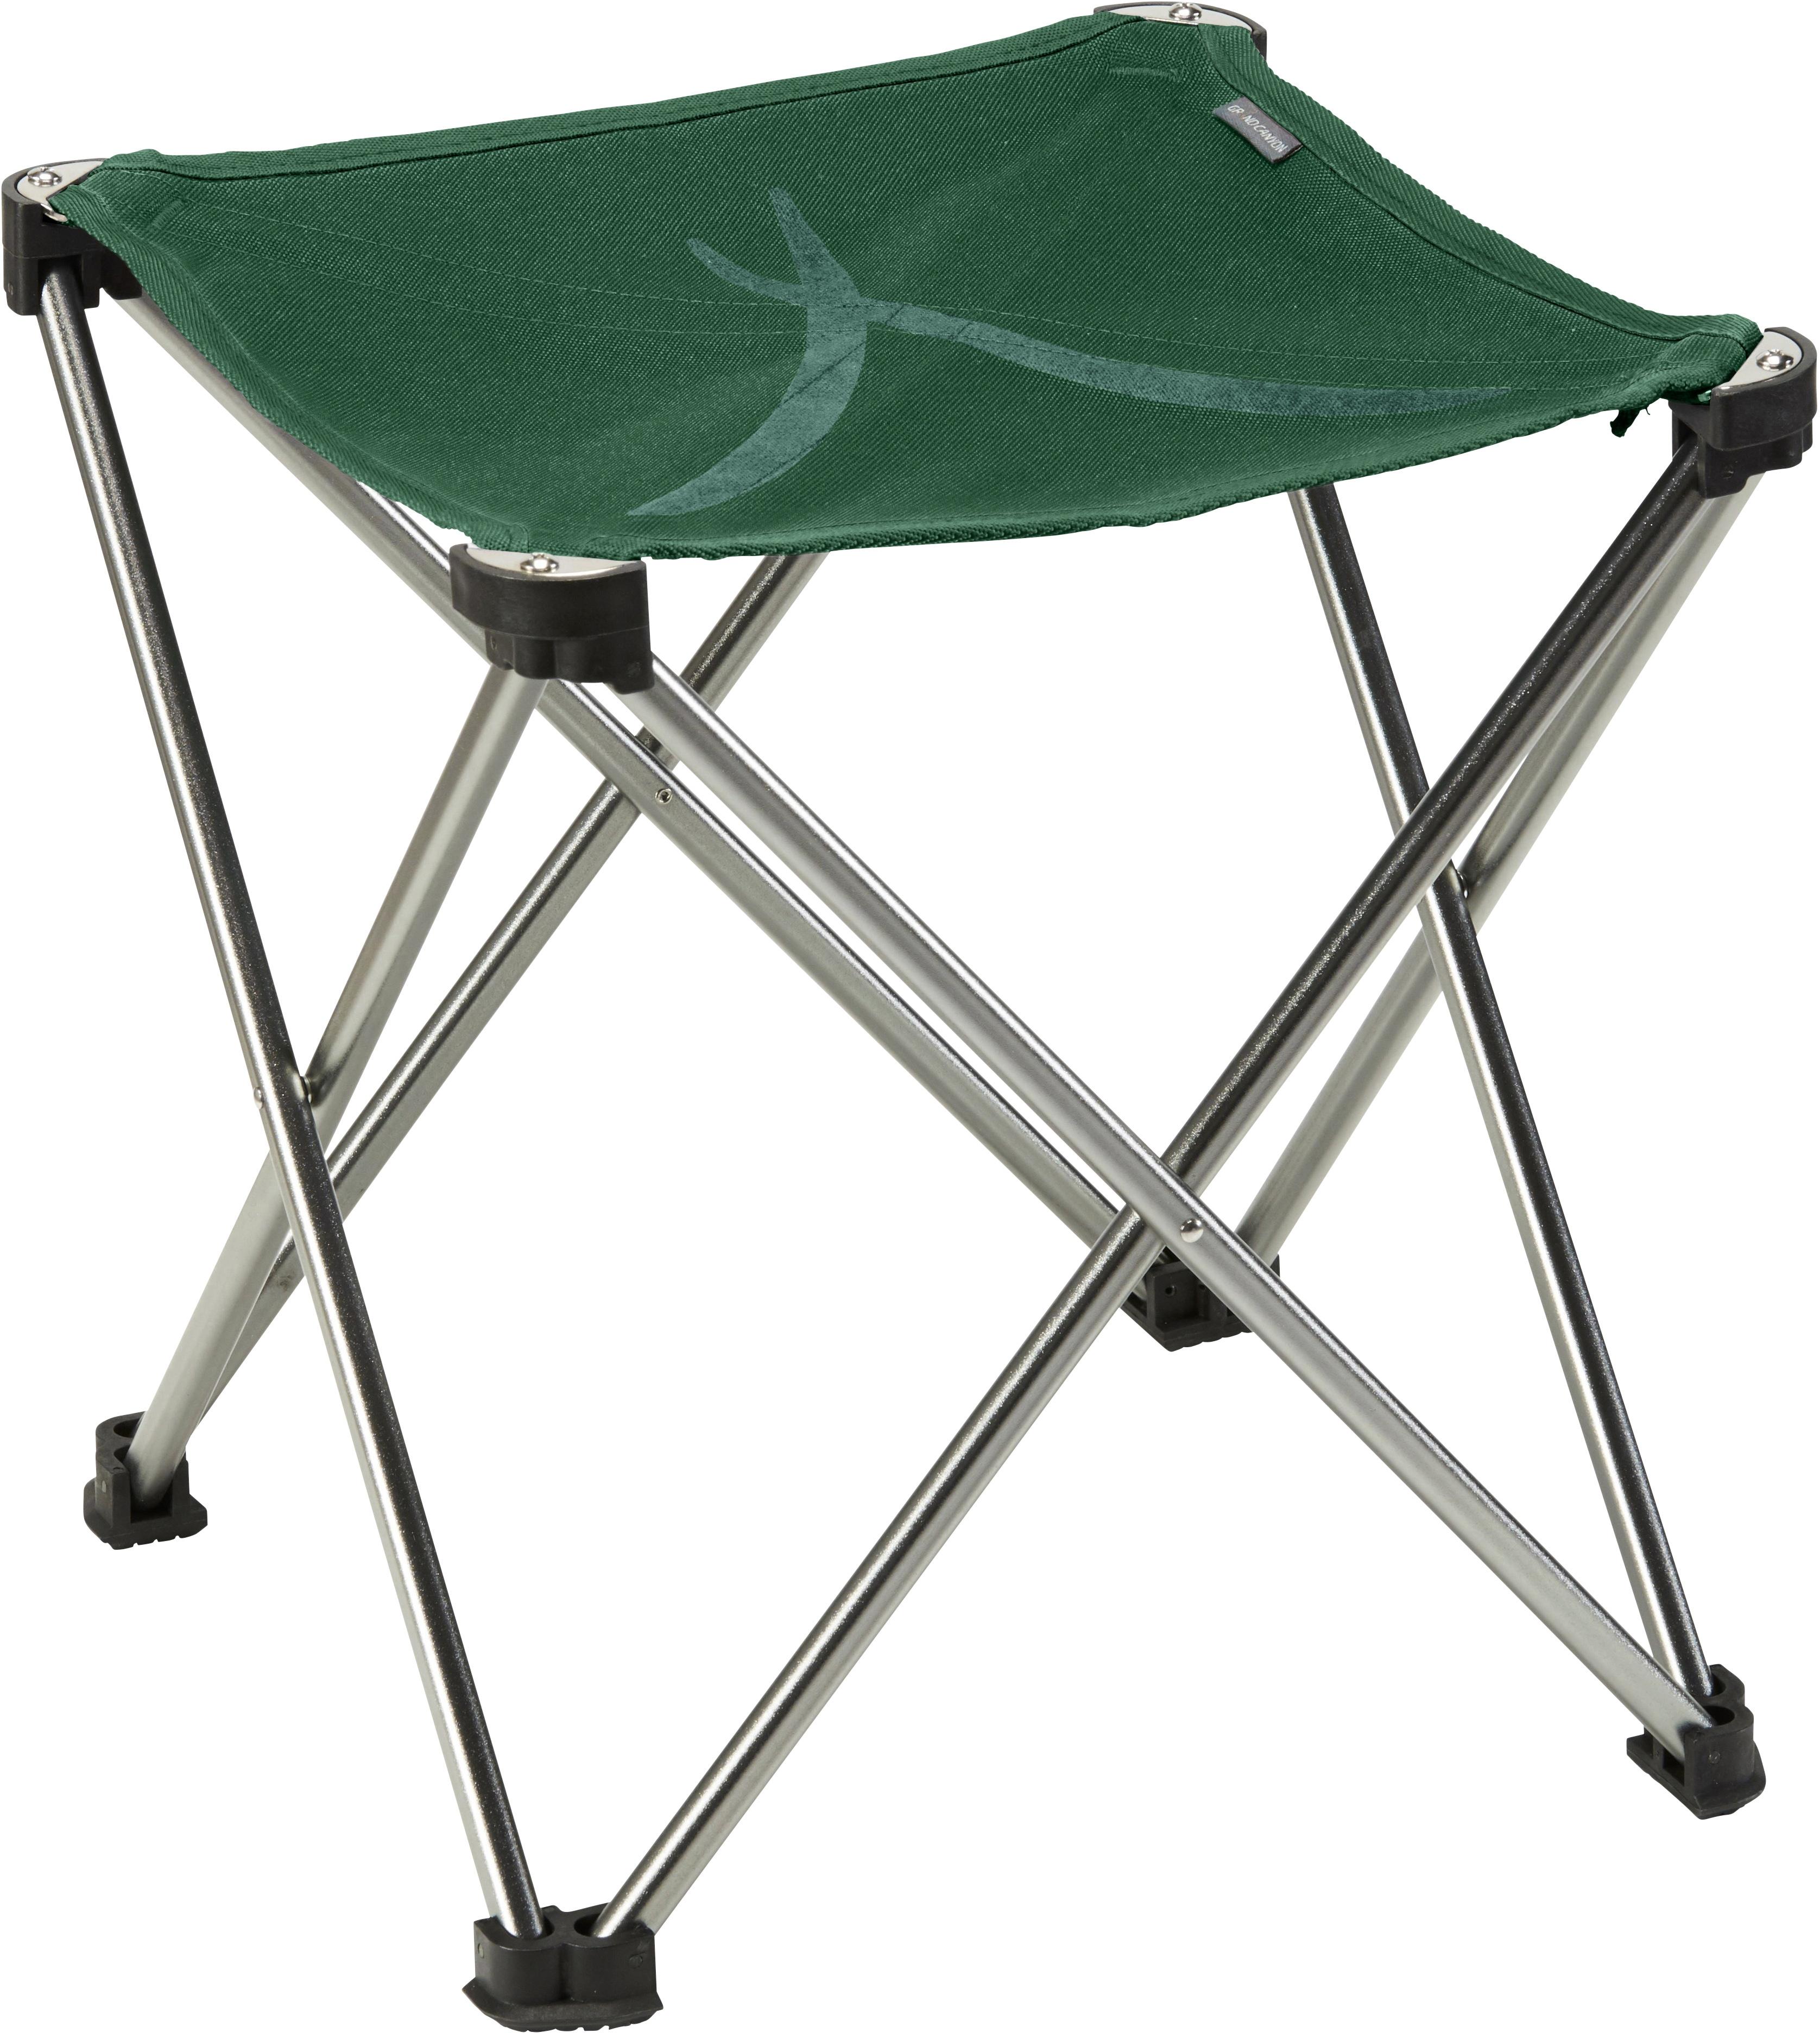 GRAND CANYON Campingstuhl SINYALA MINI grün Campingmöbel Camping Schlafen Outdoor